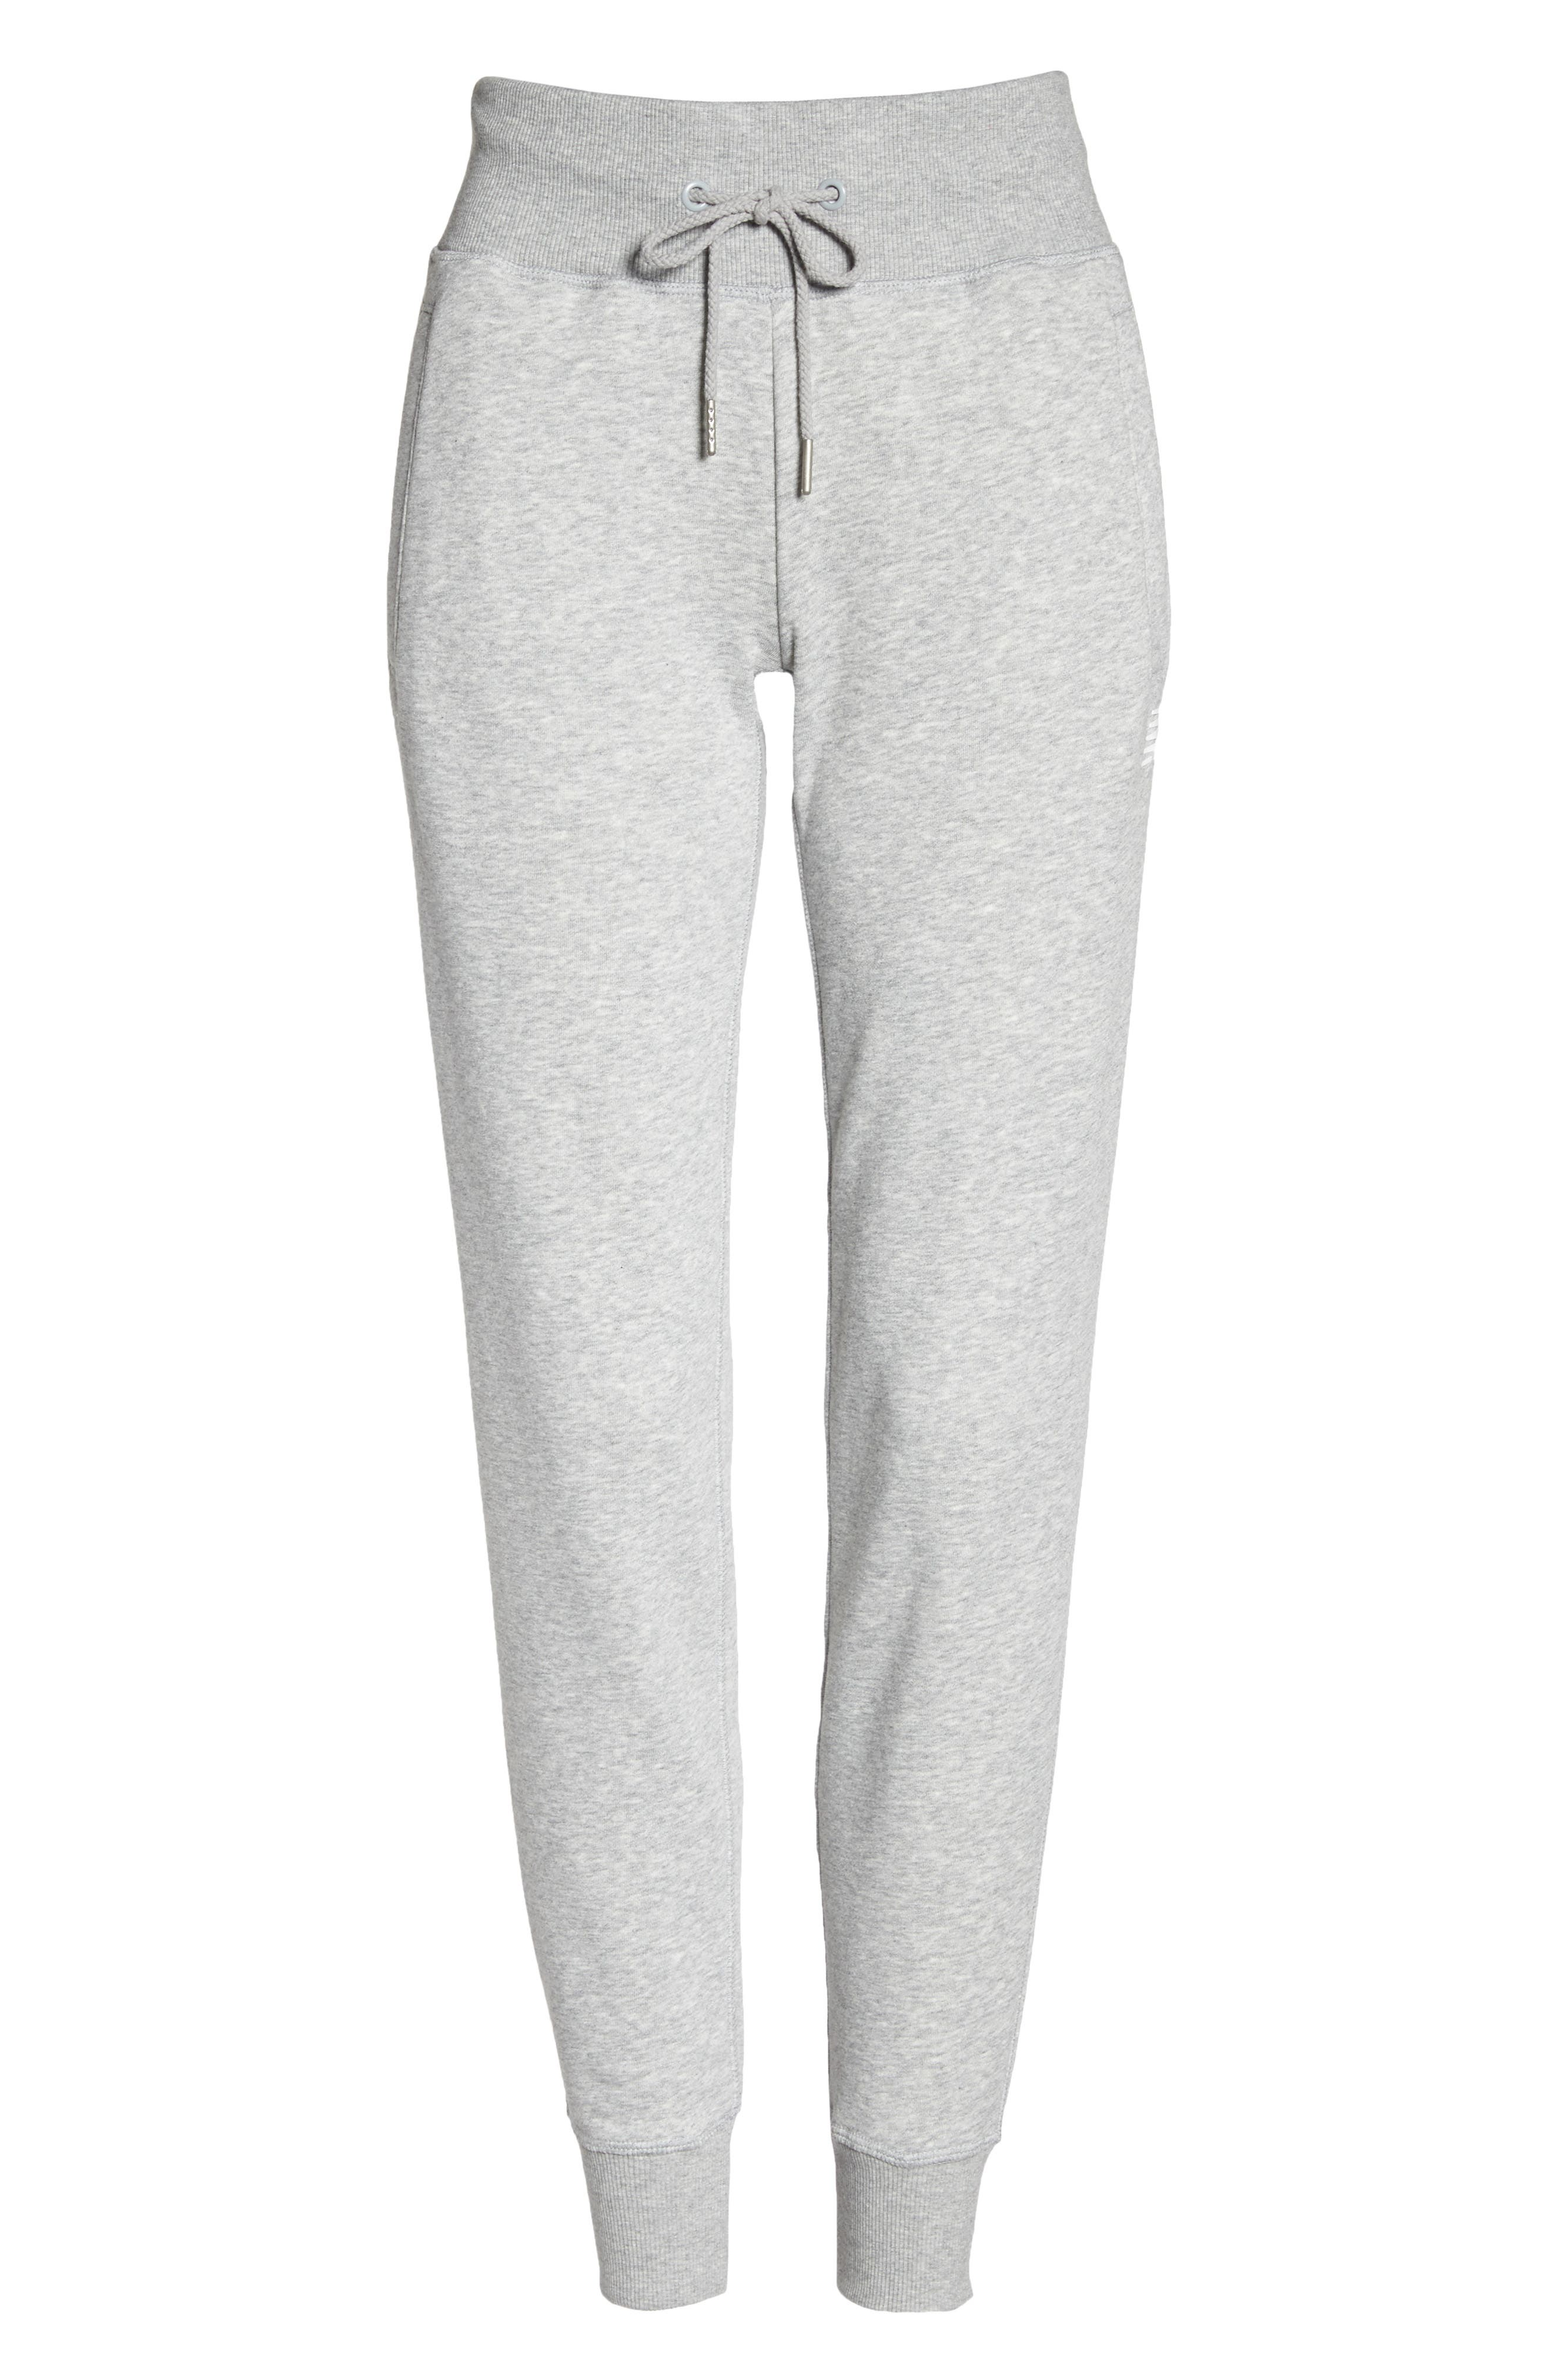 Essentials Sweatpants,                             Alternate thumbnail 7, color,                             Athletic Grey